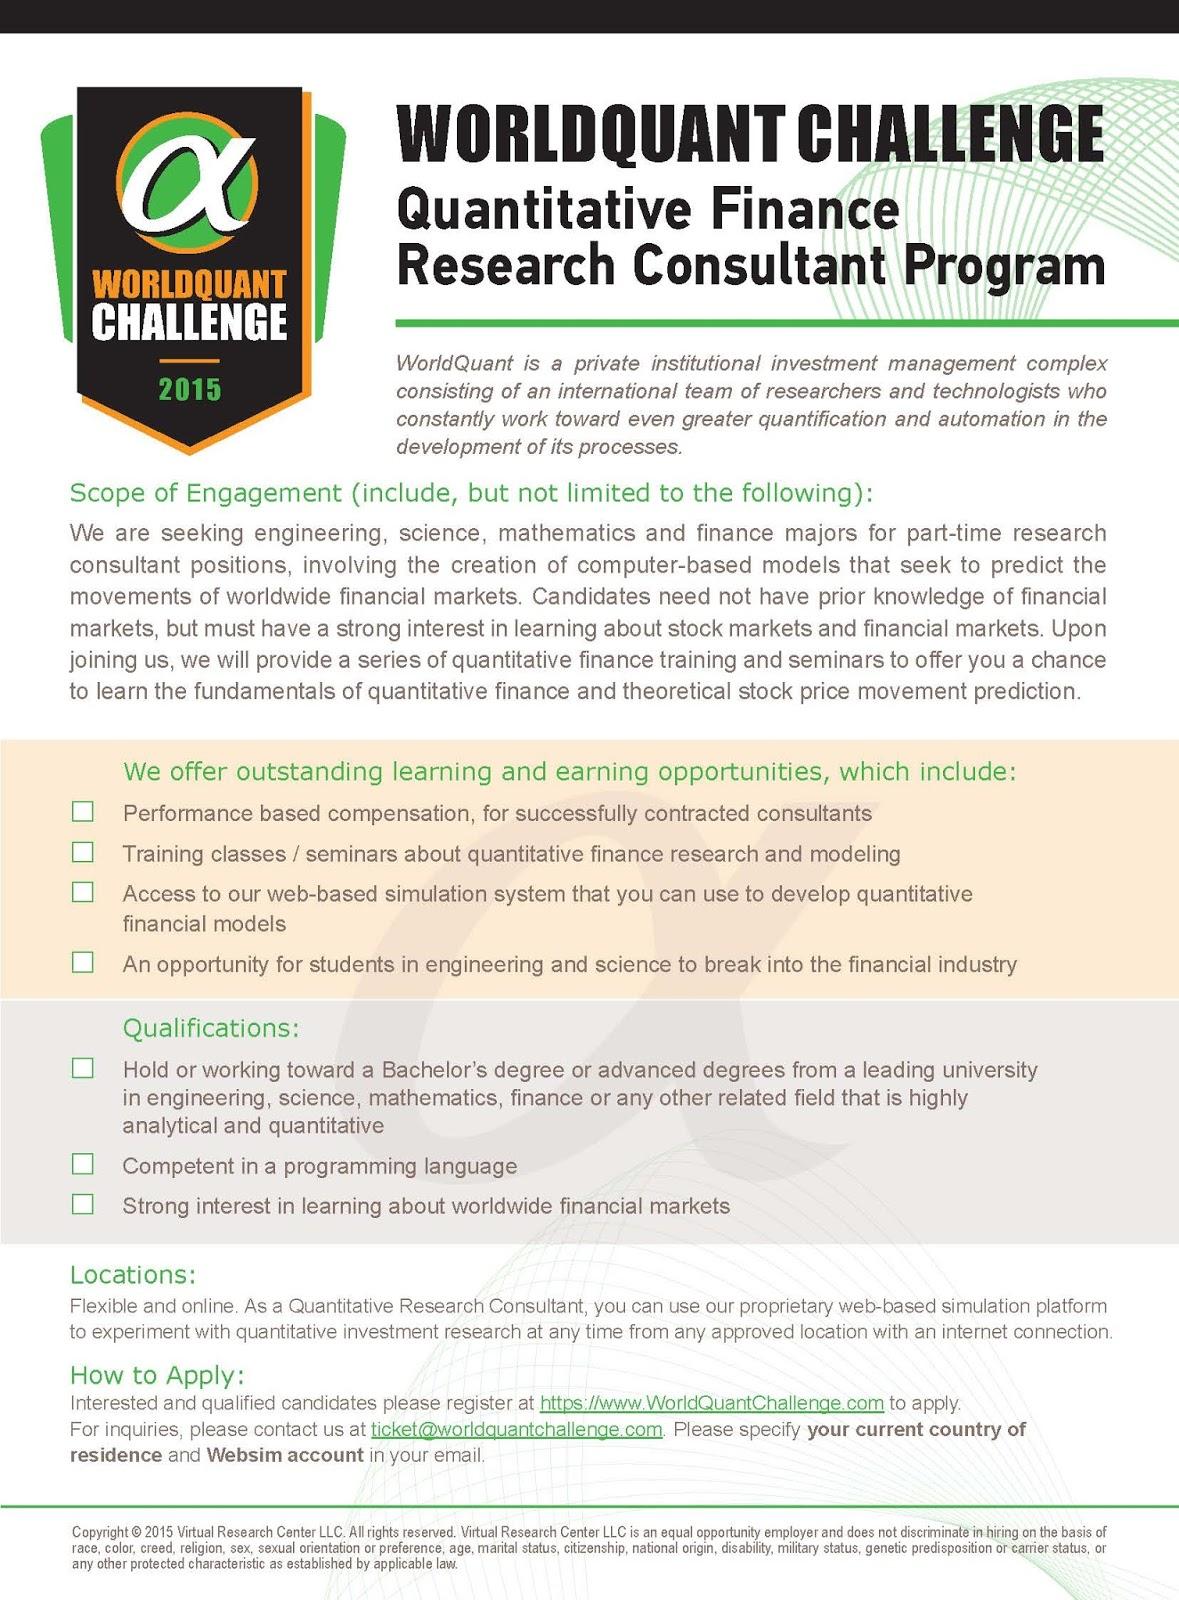 ECON Undergraduate Blog: WorldQuant Finance Research Consultant Program